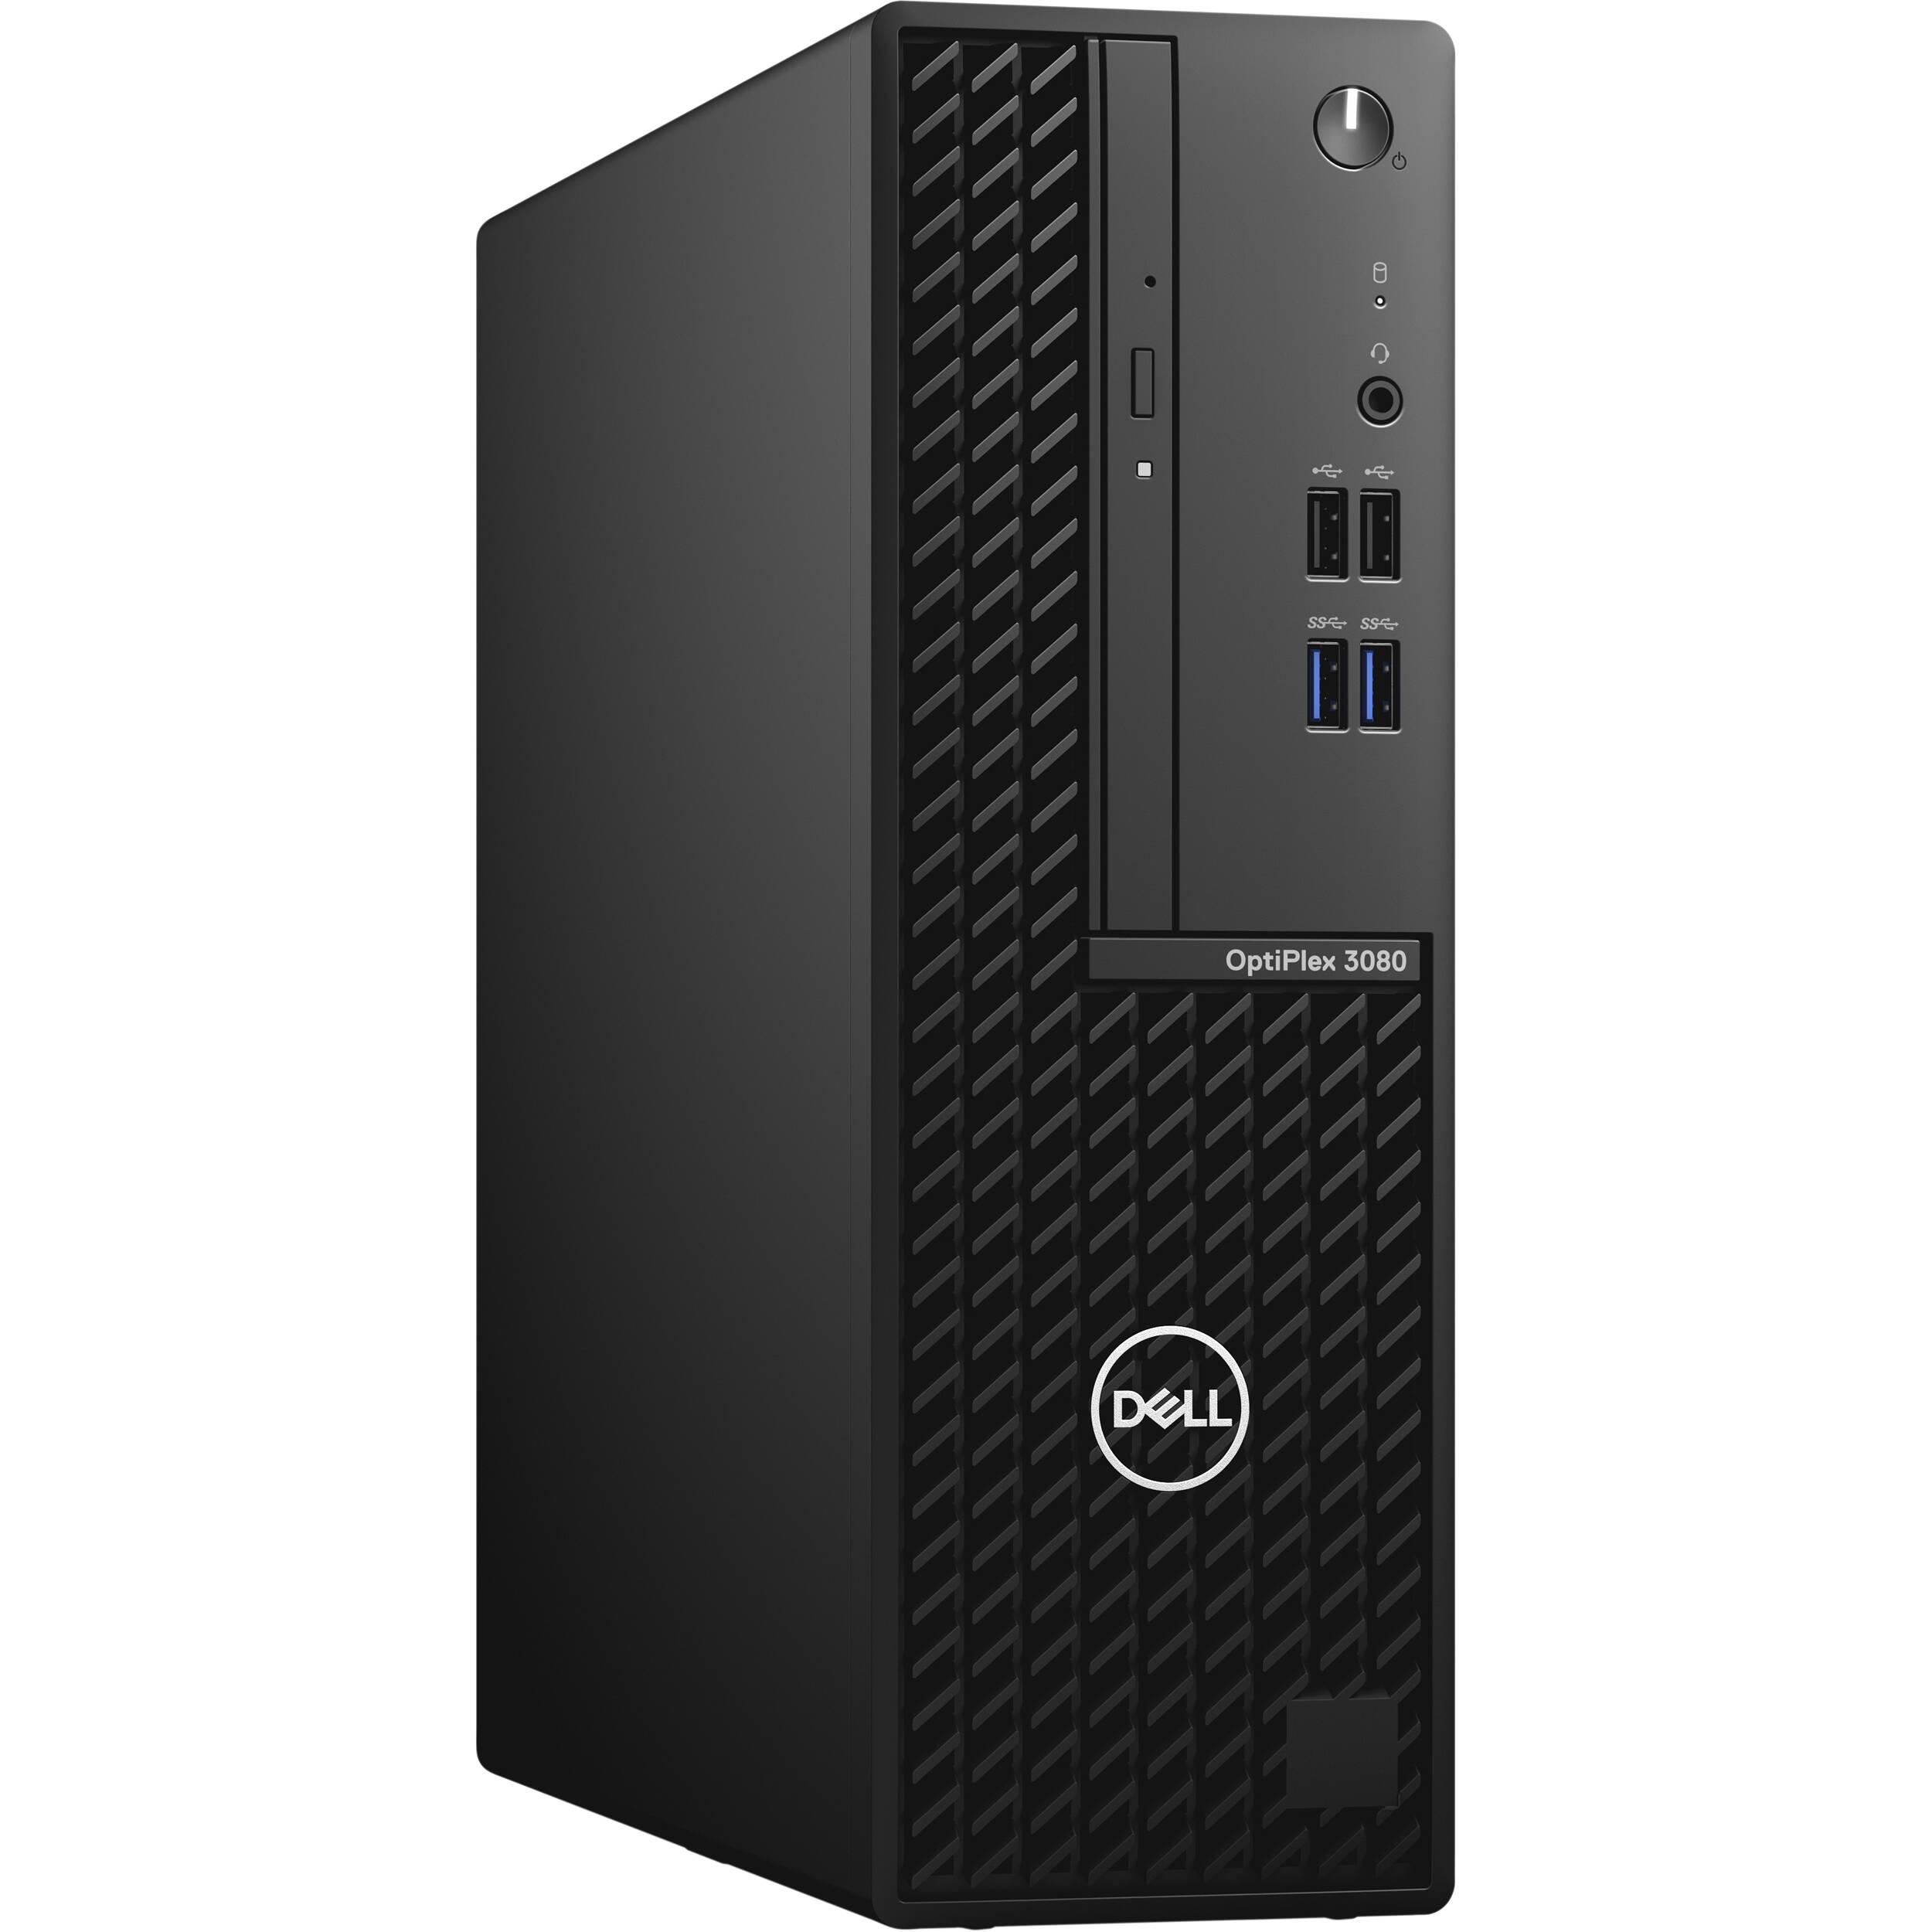 Máy tính để bàn Dell OptiPlex 3080 SFF,Intel Core i3-10100,4GB RAM,256GB SSD,DVDRW,VGA Port,Mouse,Keyboard,Fedora,1Yr